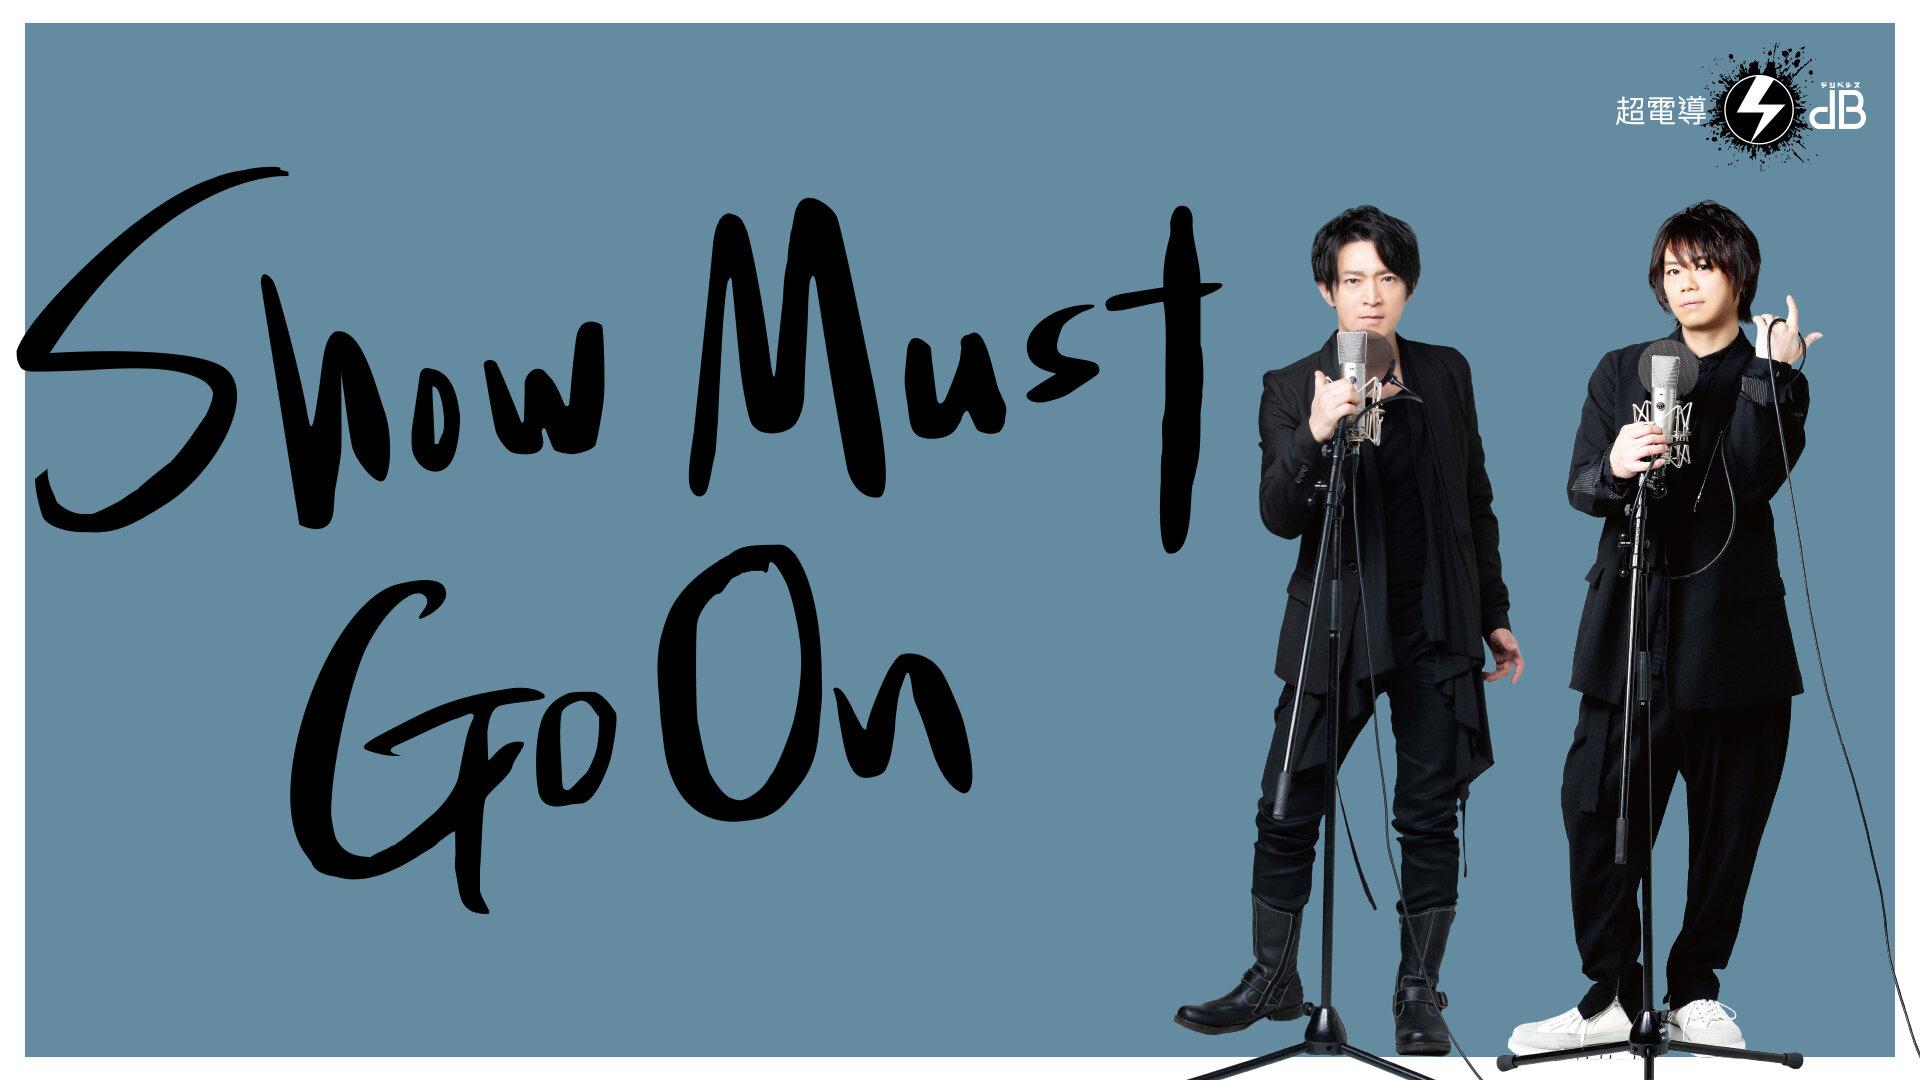 「SHOW MUST GO ON」(9月22日 夜・大阪公演)(dアニメストア)